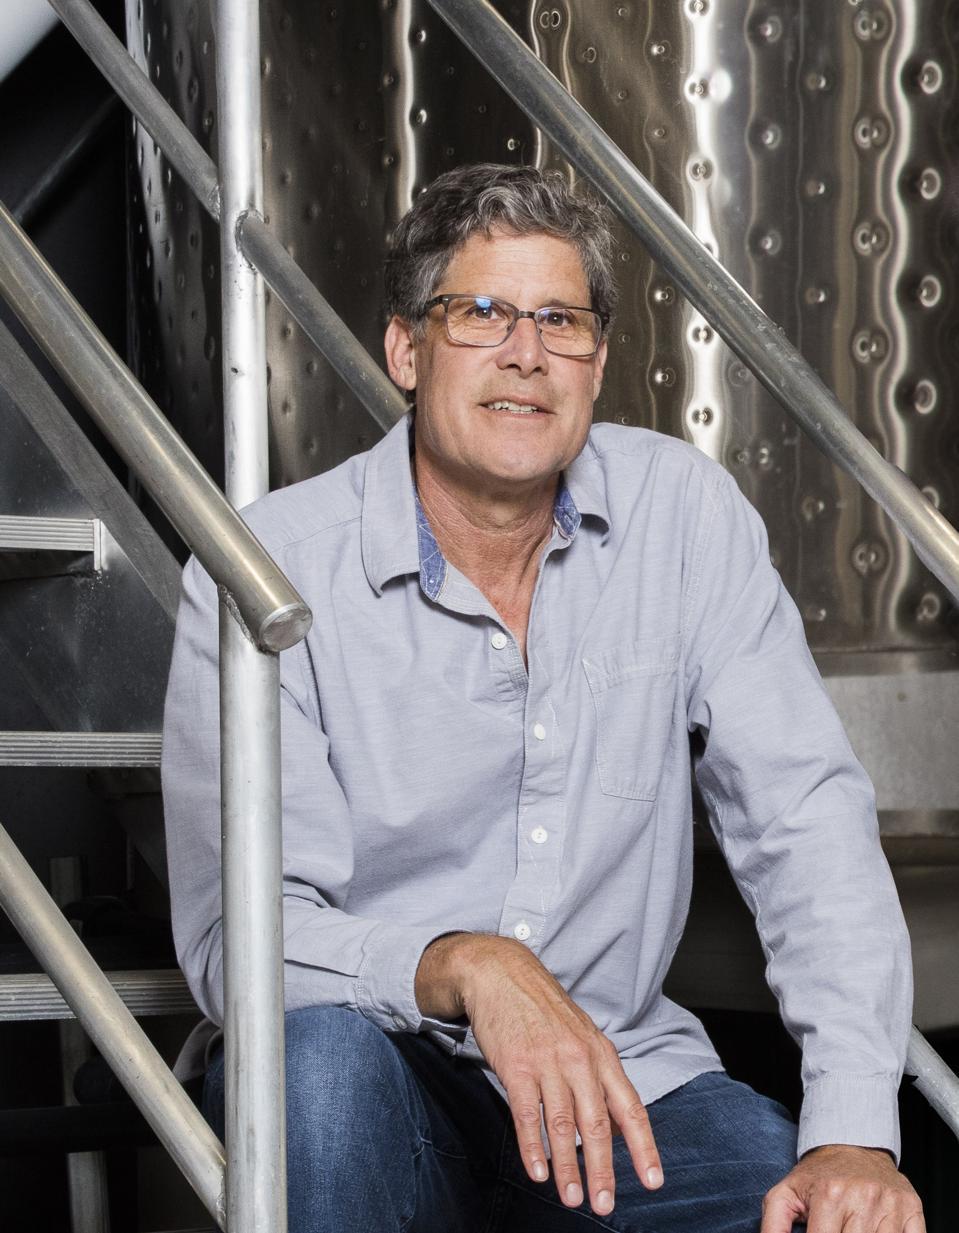 Longtime Chappellet Winemaker, Phillip Corallo-Titus